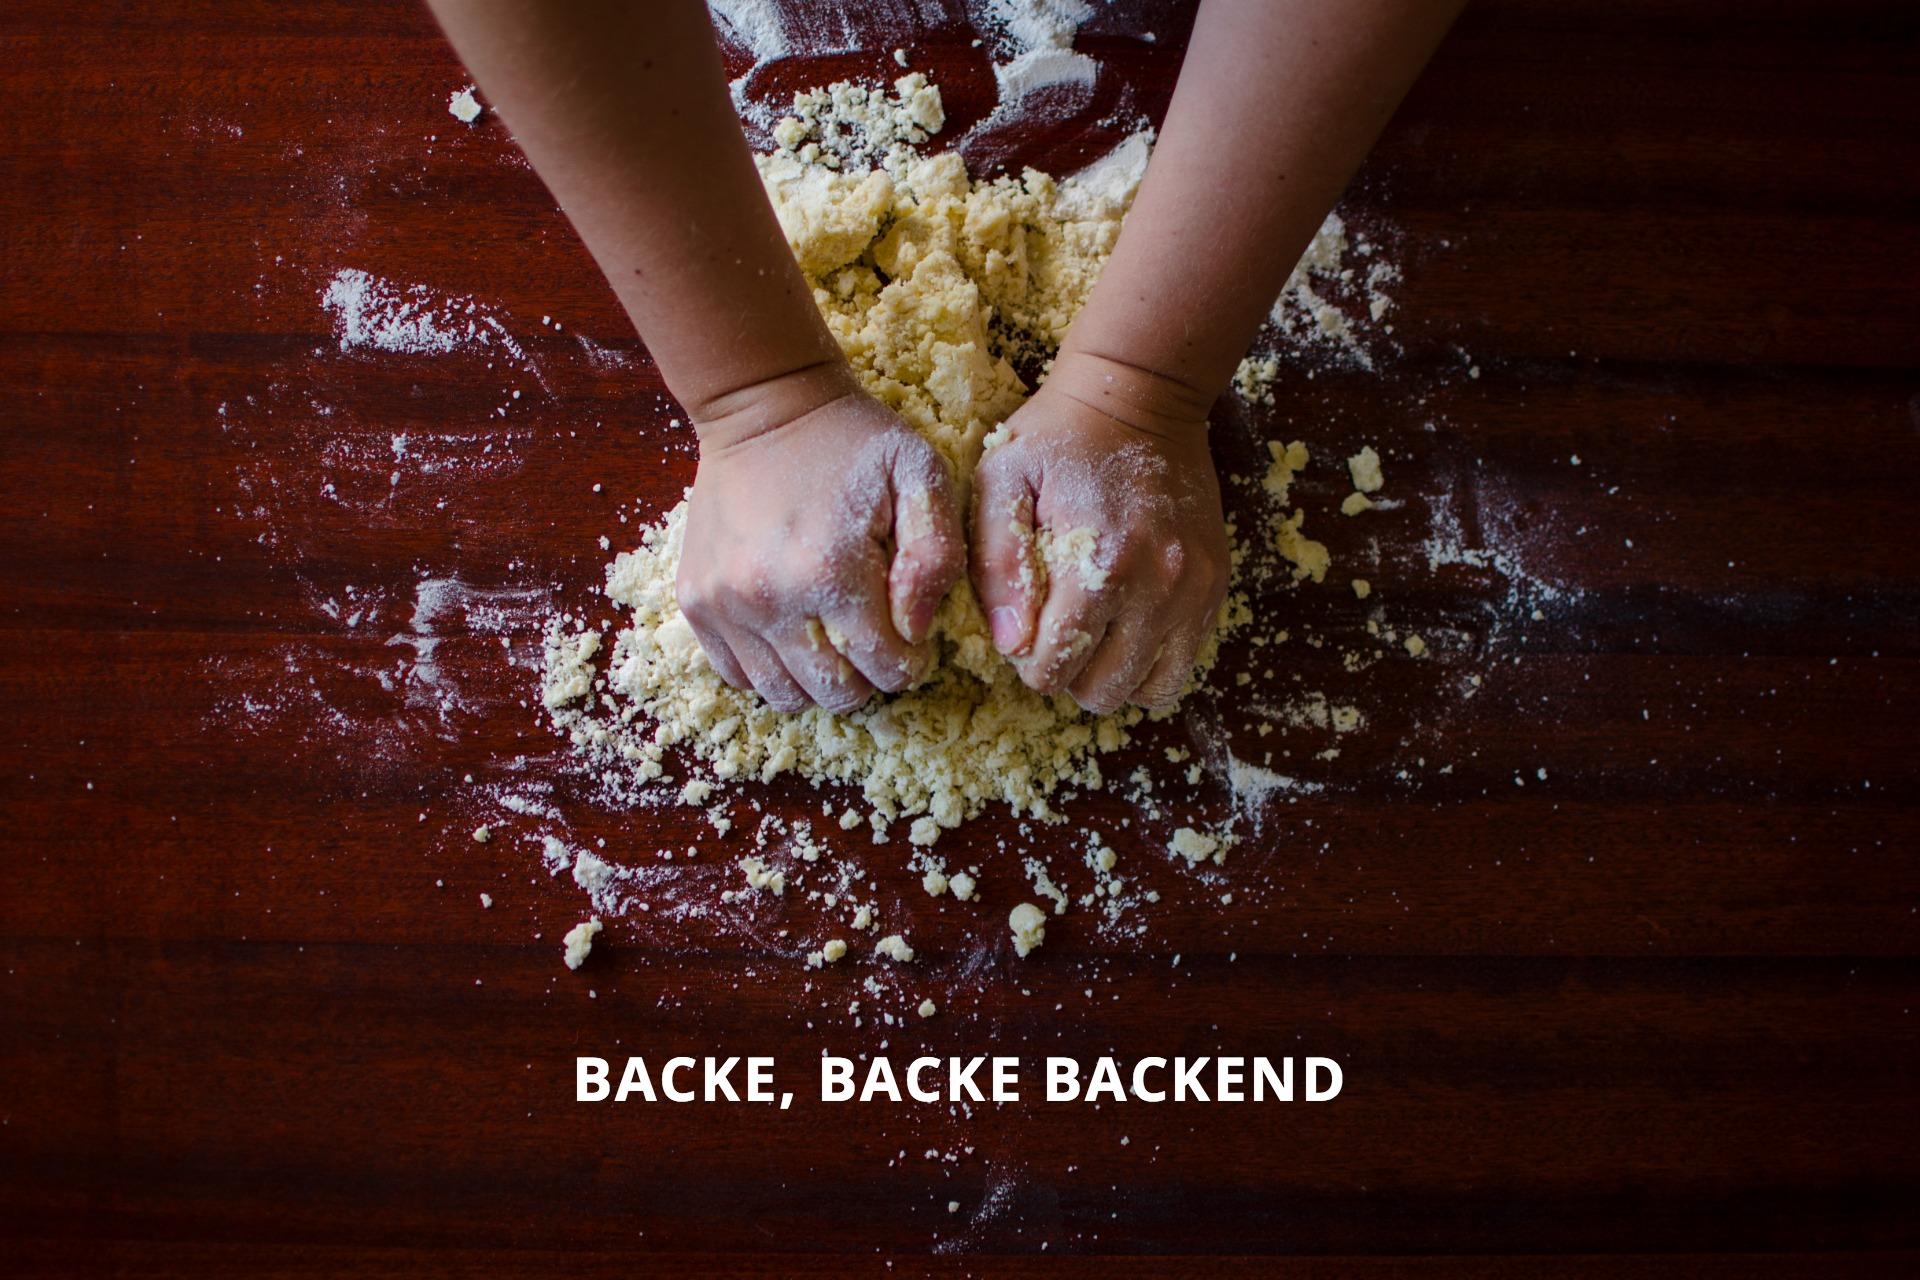 Backe, backe Backend